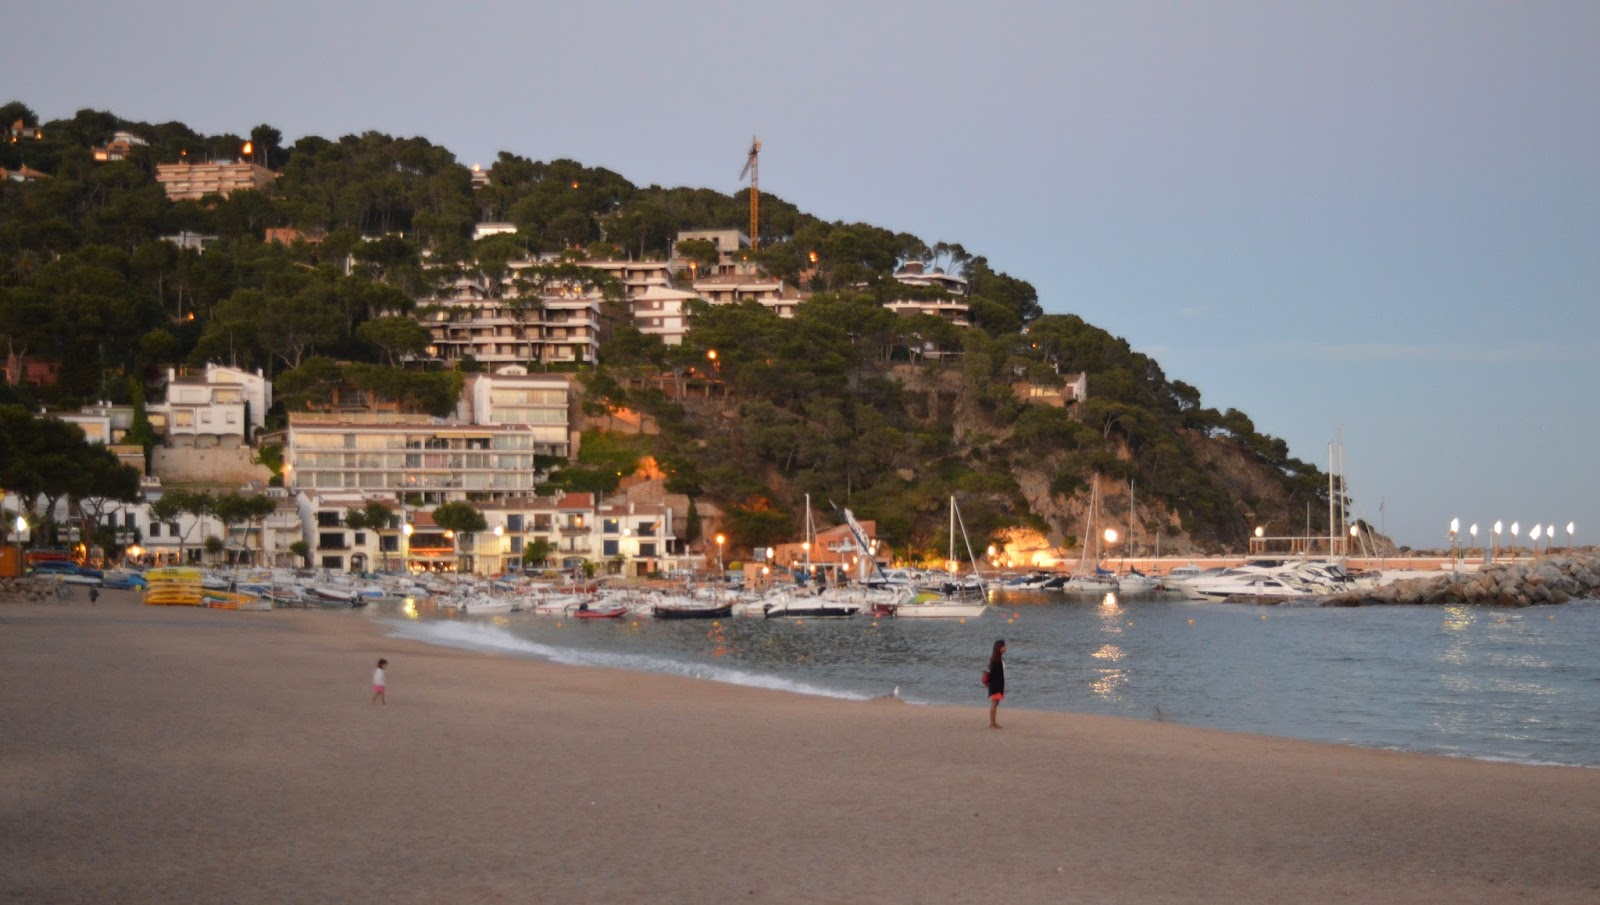 A walk from Calella de Palafrugell to Llafranc - beach